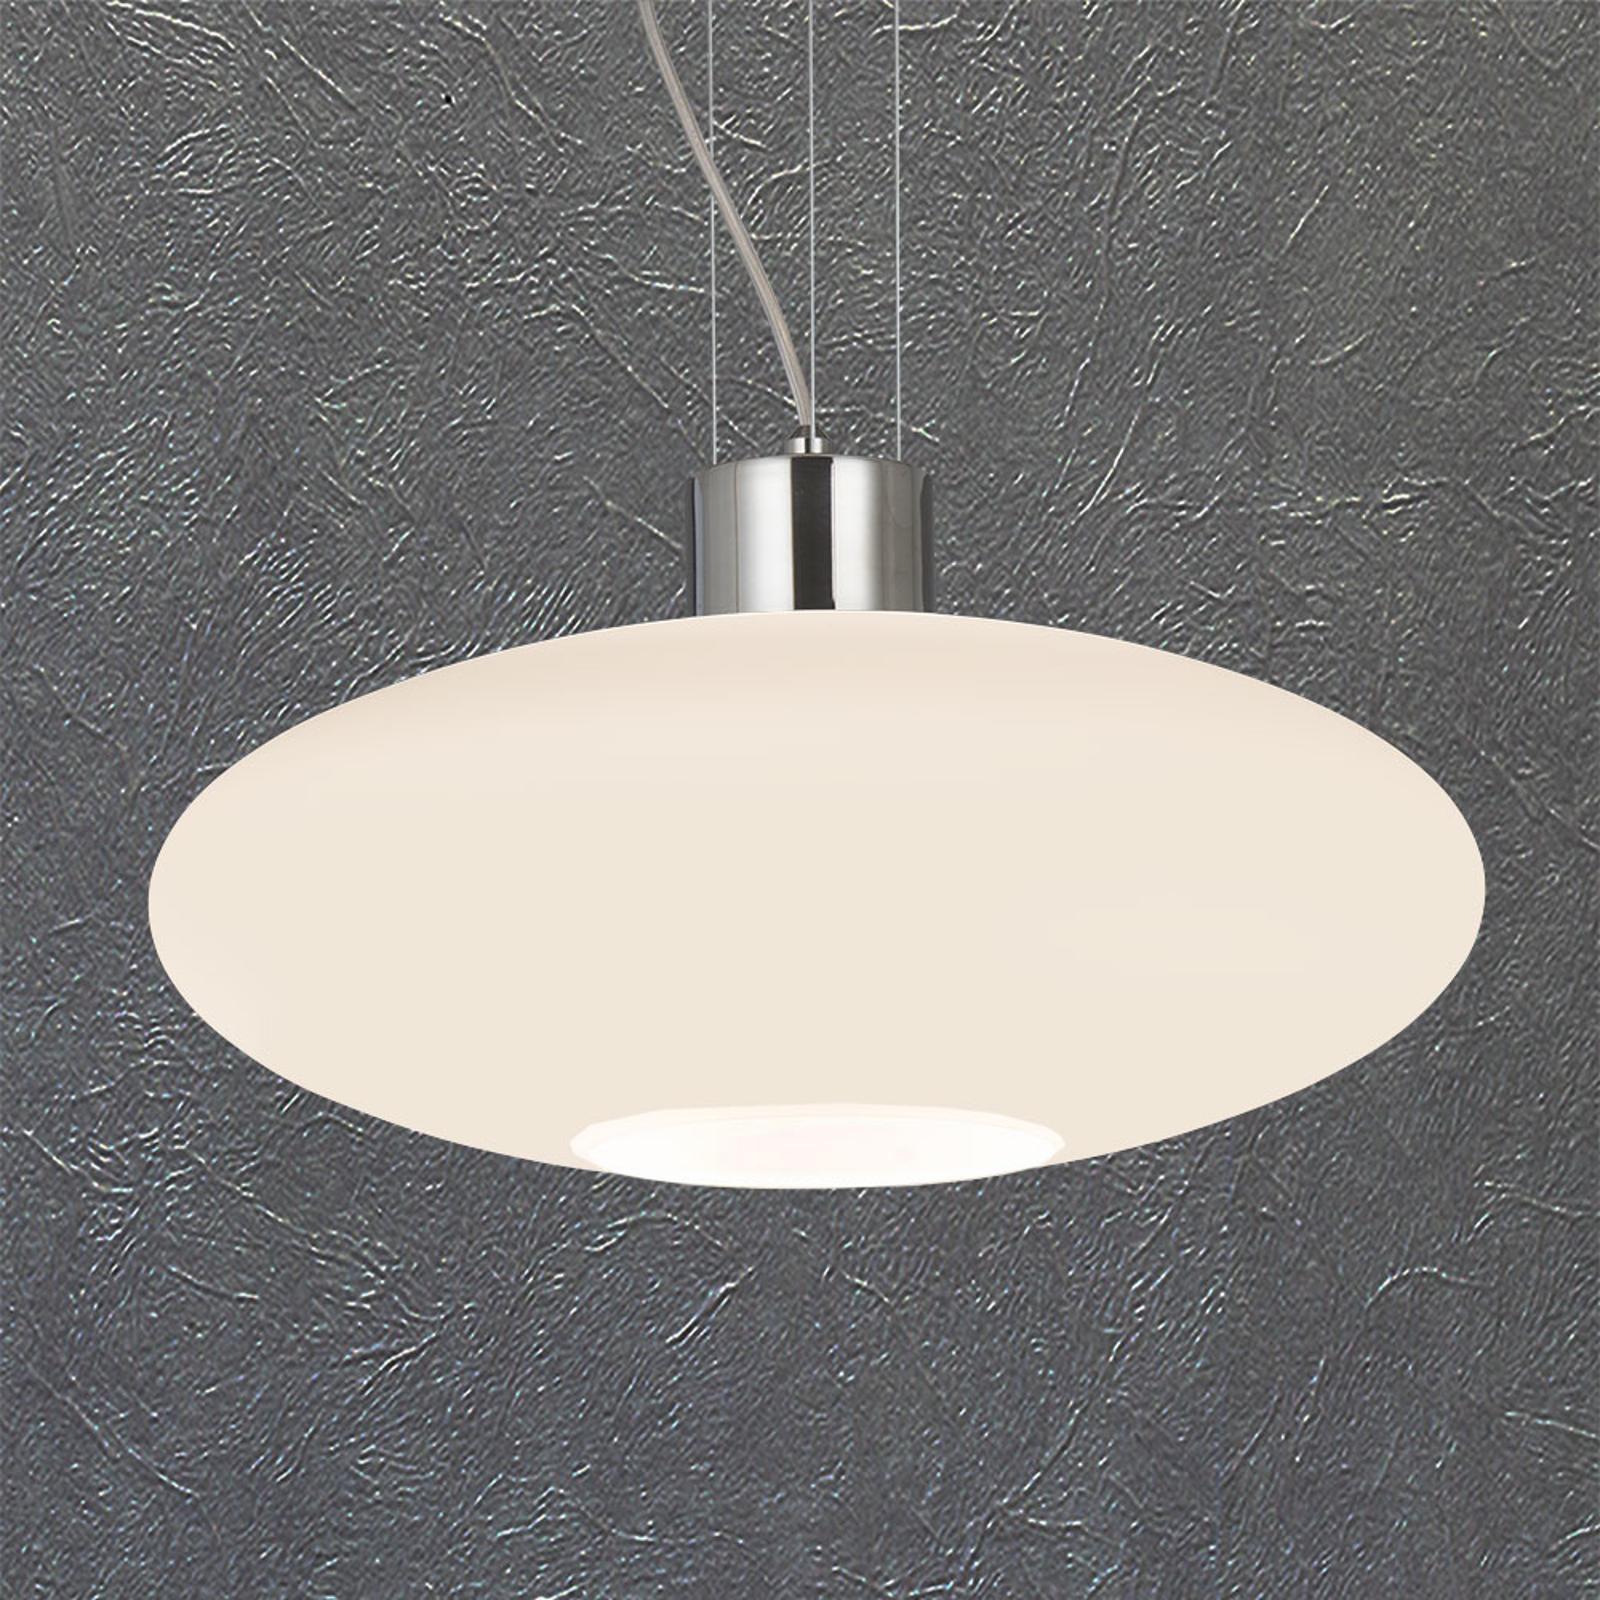 Lampa wisząca Boop 40cm